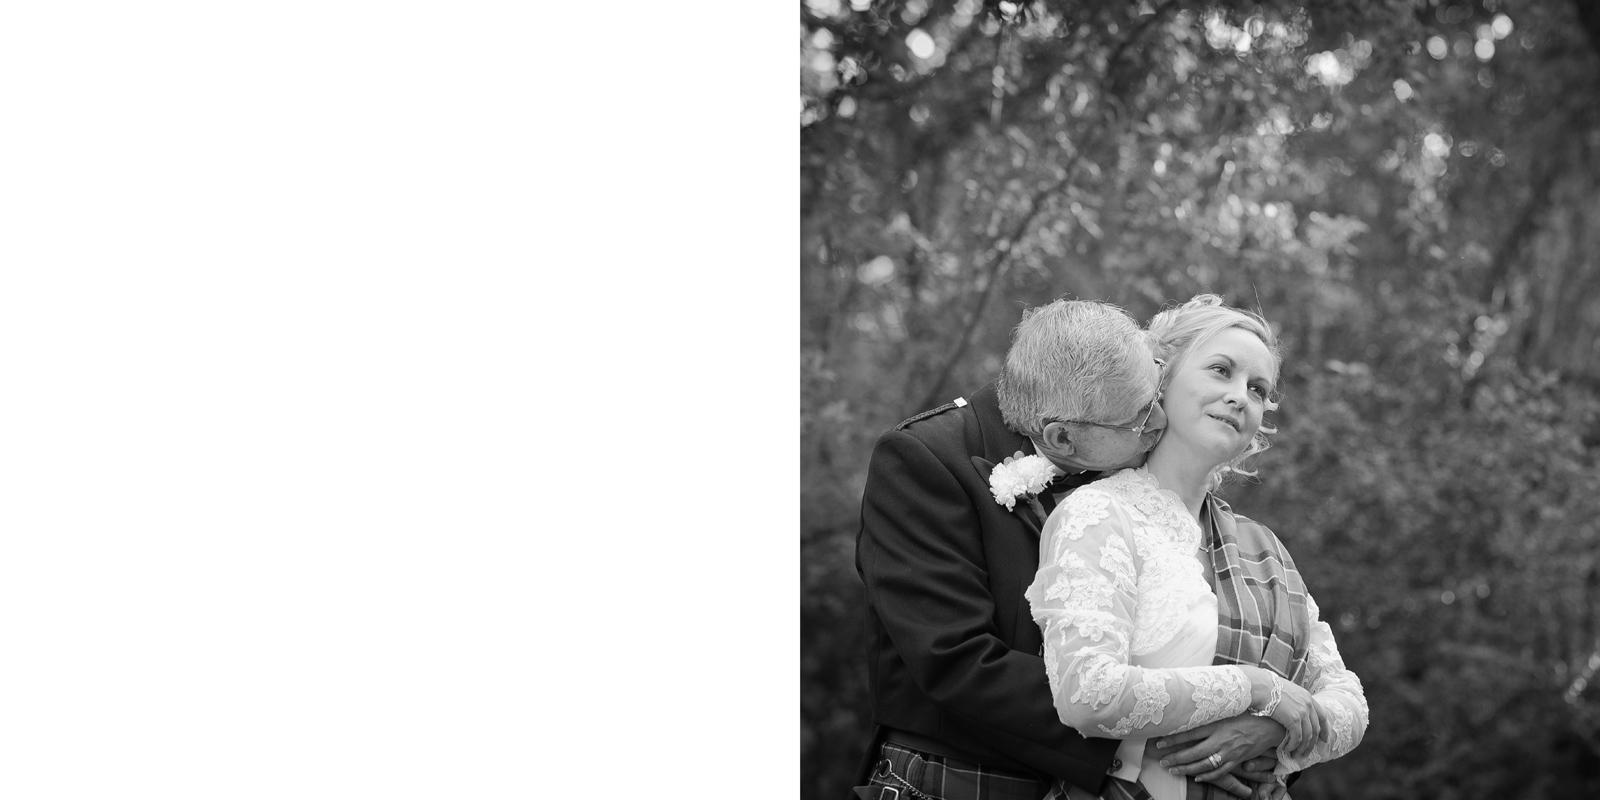 Nathalie Boucry Photography | Deidre and Lister Wedding Album 002